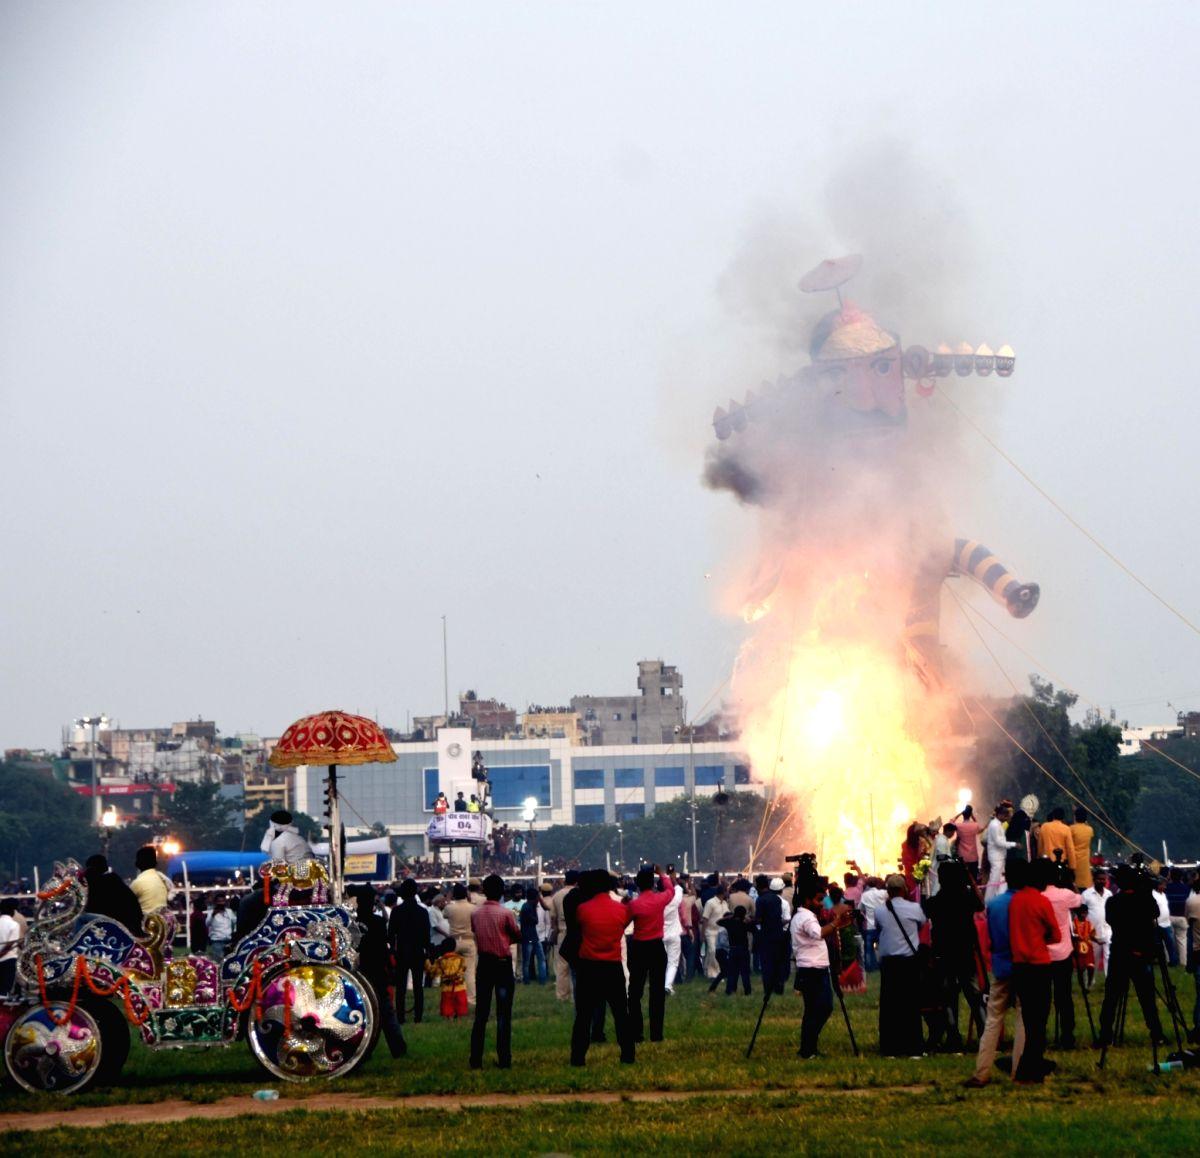 Patna: The effigy of Ravana being burned at 'Ramleela Mahotsav' during Dussehra celebrations in Patna, on Oct 8, 2019.